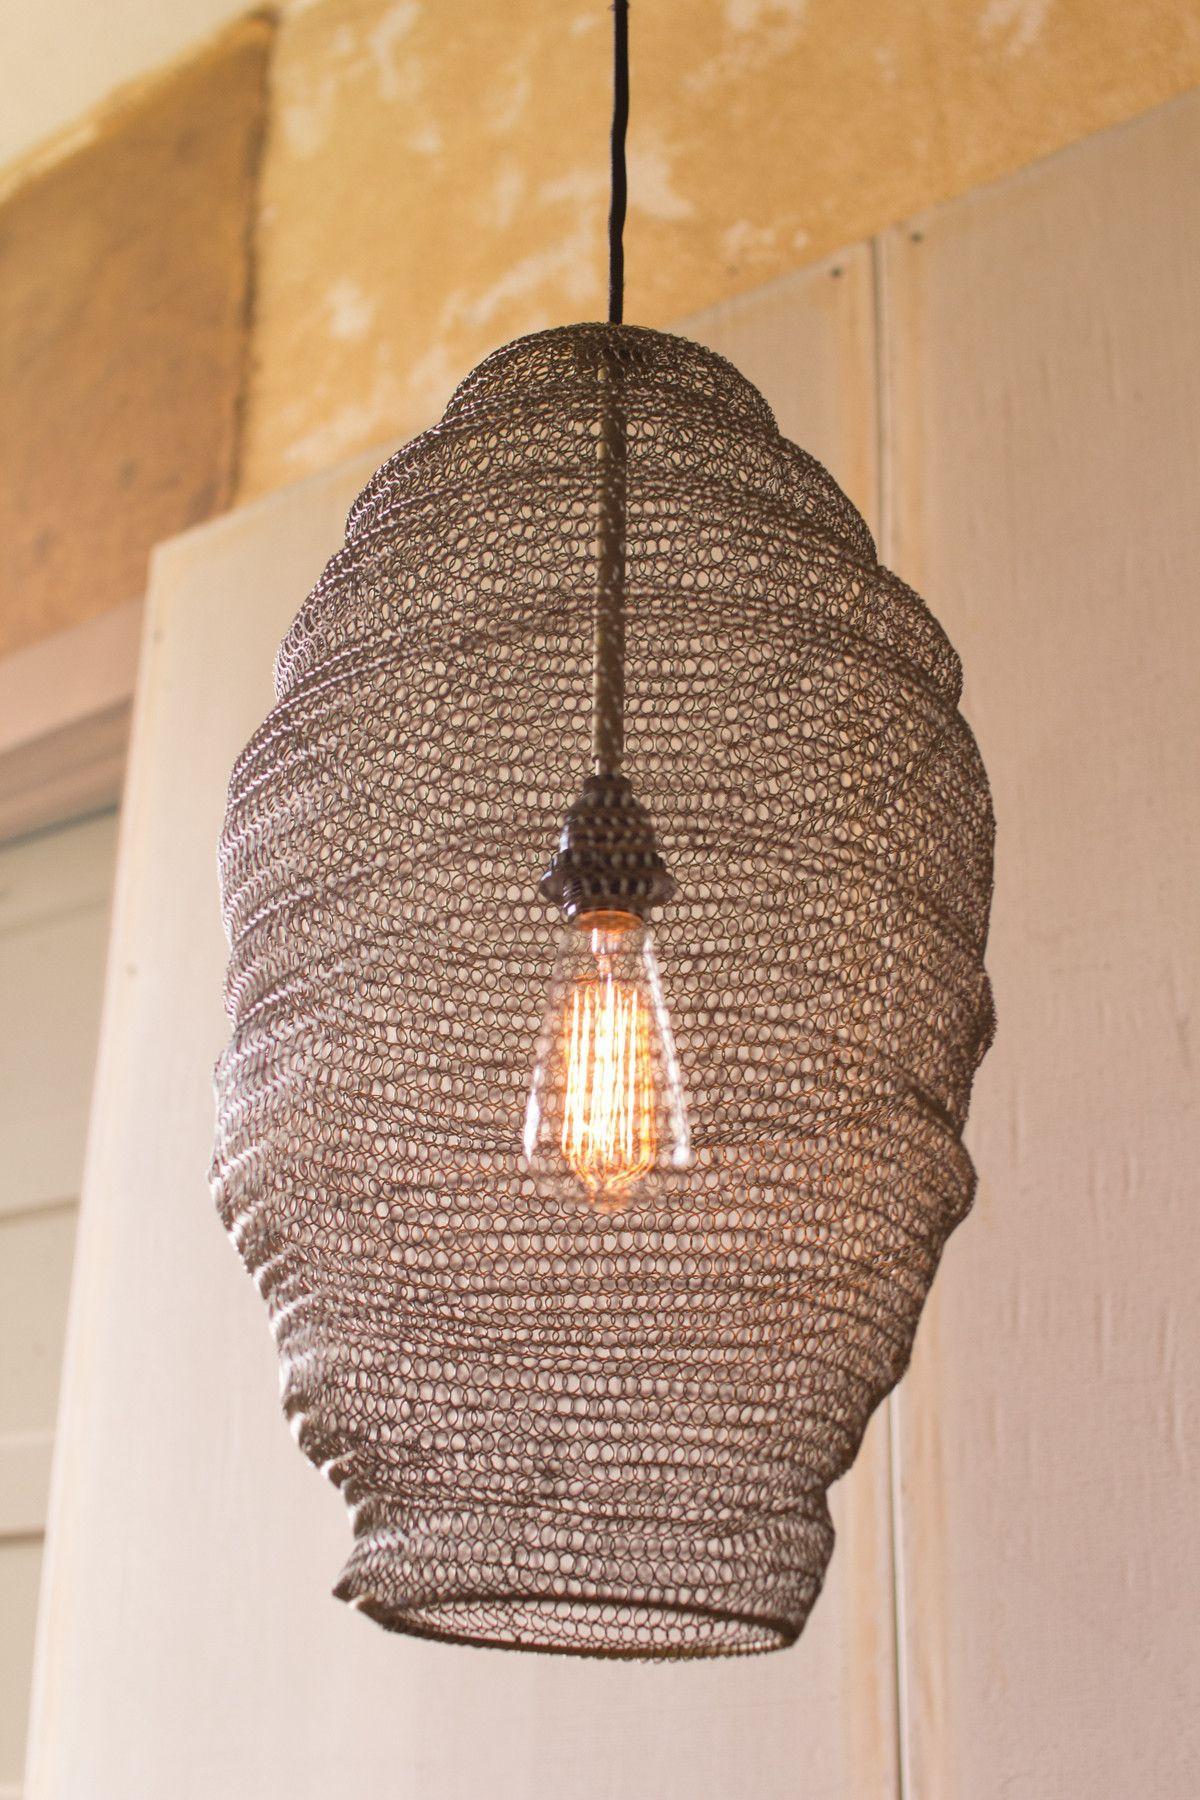 Kalalou old gold wire basket pendant lamp lighting pinterest kalalou old gold wire basket pendant lamp greentooth Choice Image